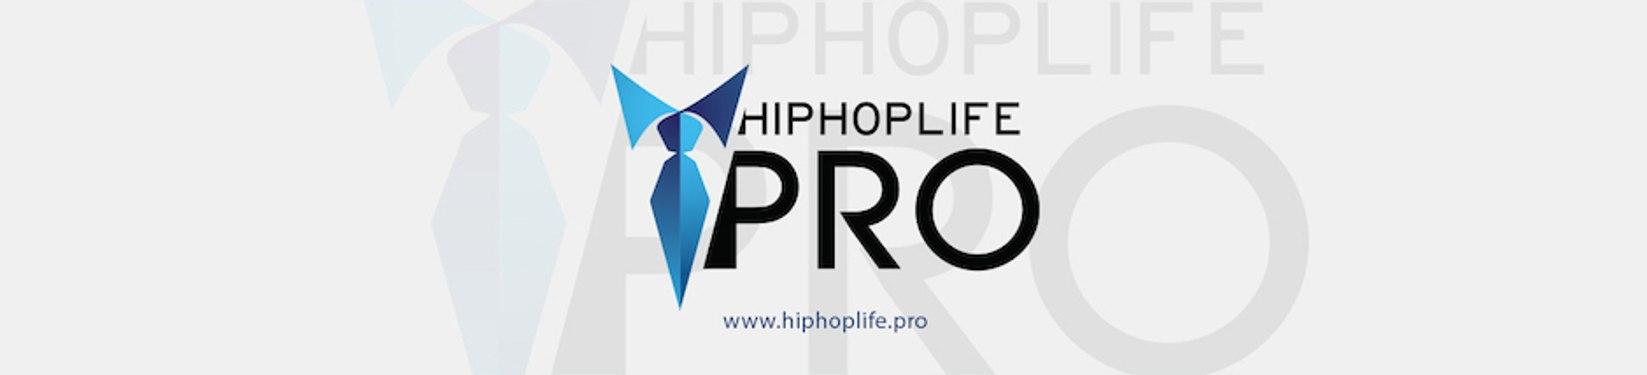 HiphoplifePRO